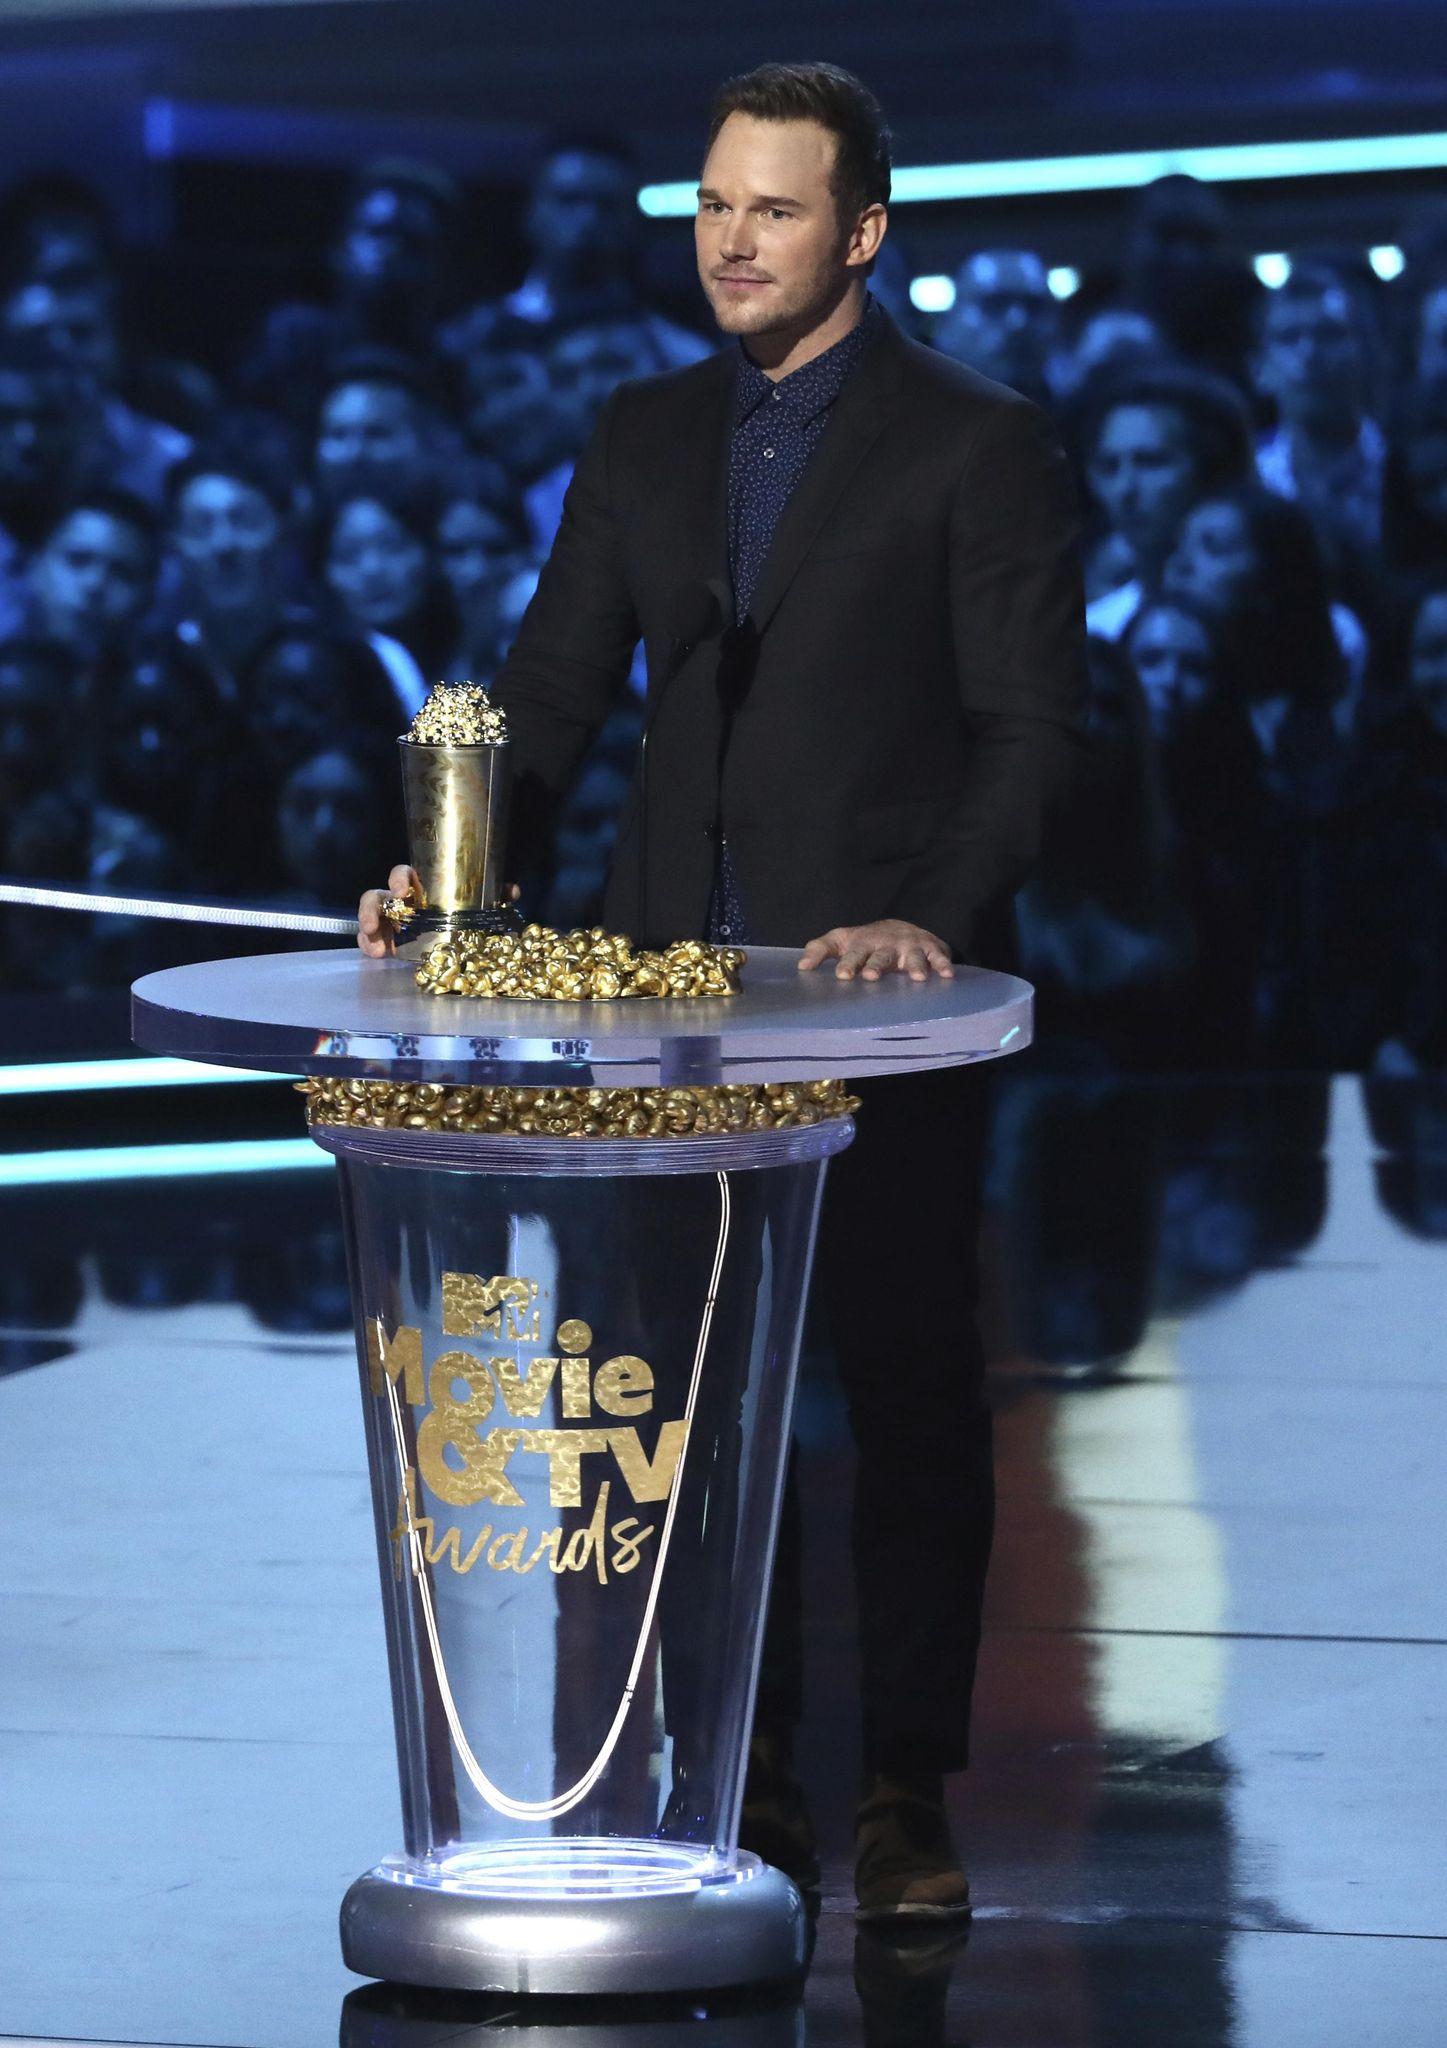 Chris Pratt shares the Gospel at the MTV Awards